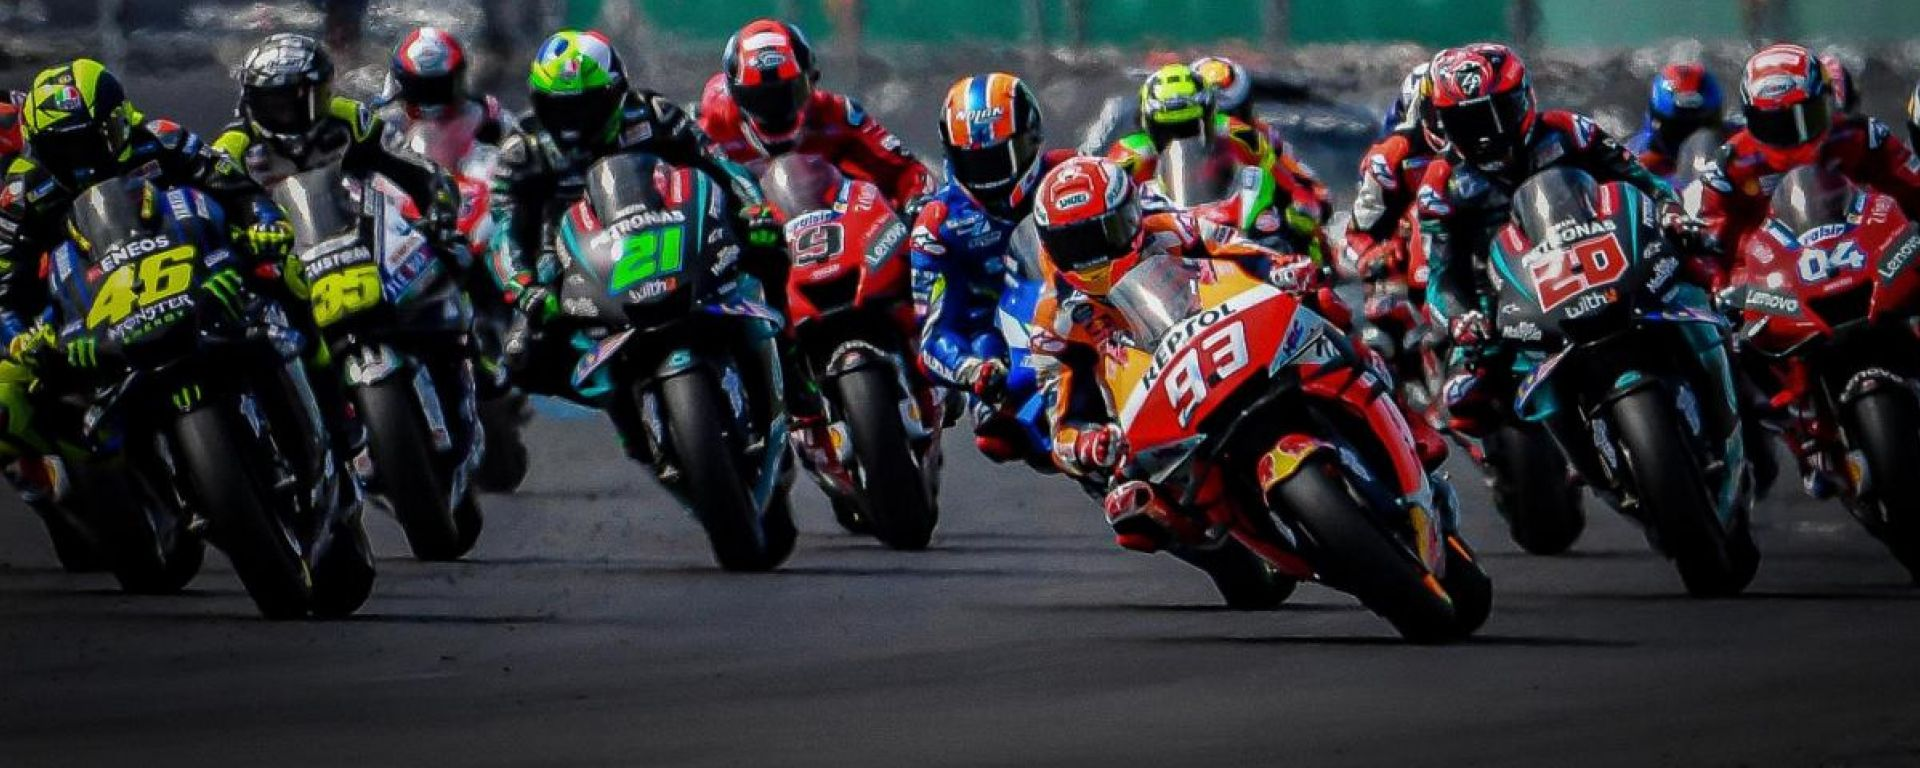 MotoGP 2019 Partenza